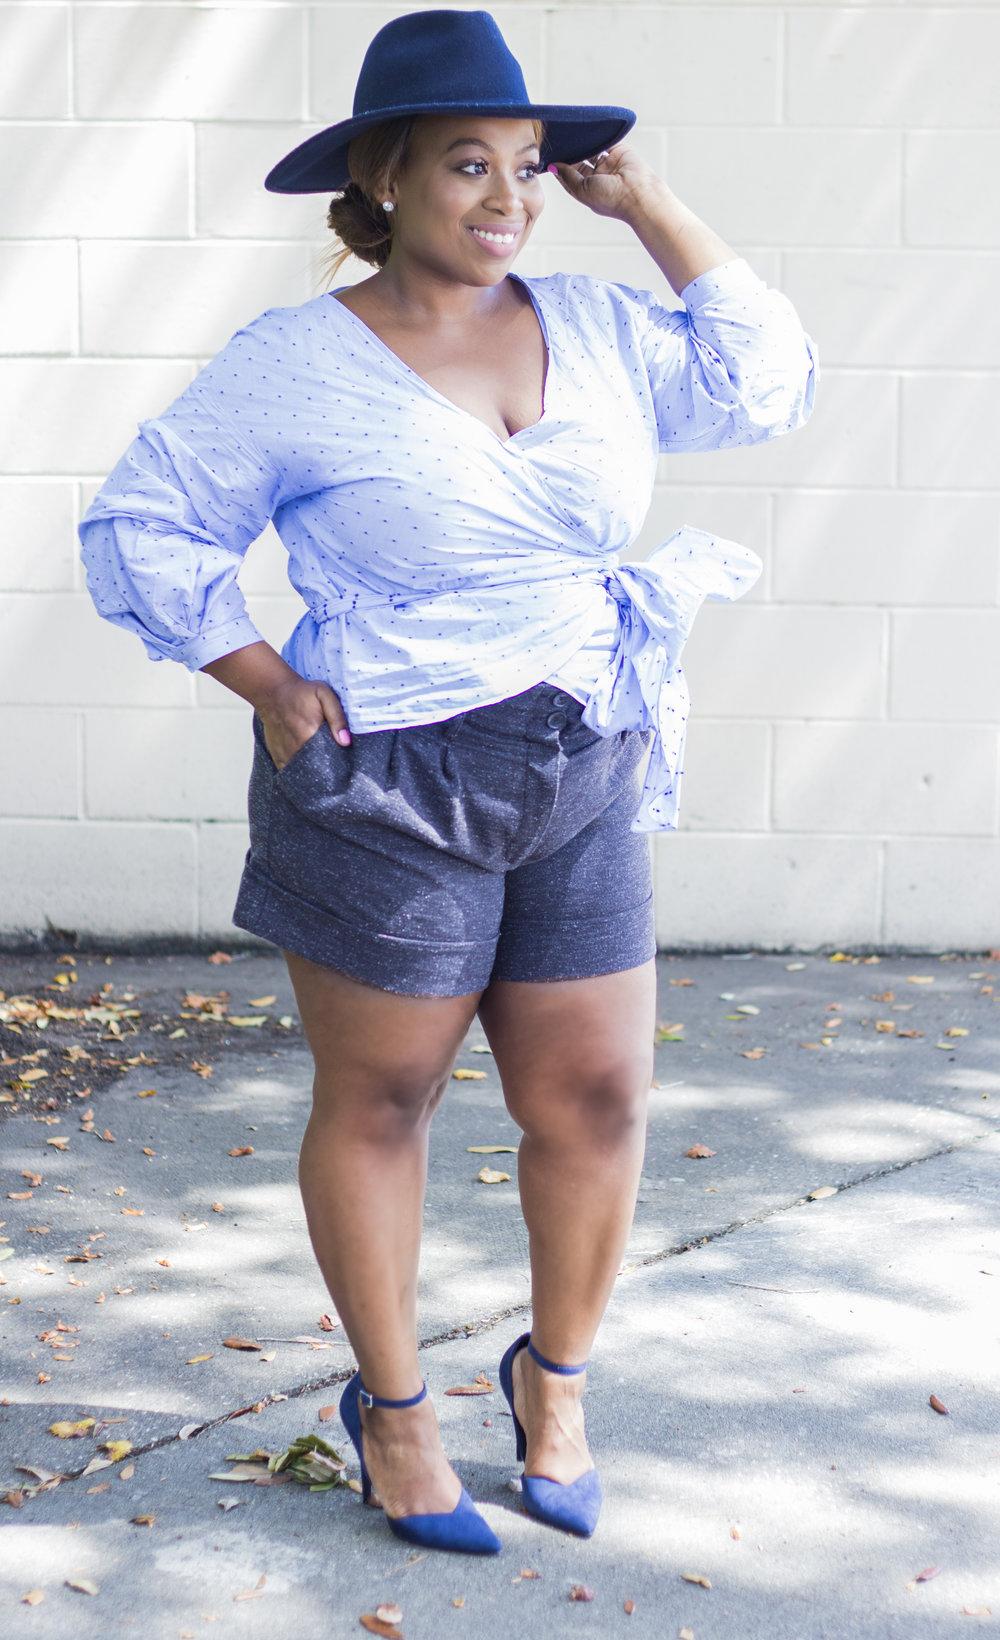 Shorts: Forever21